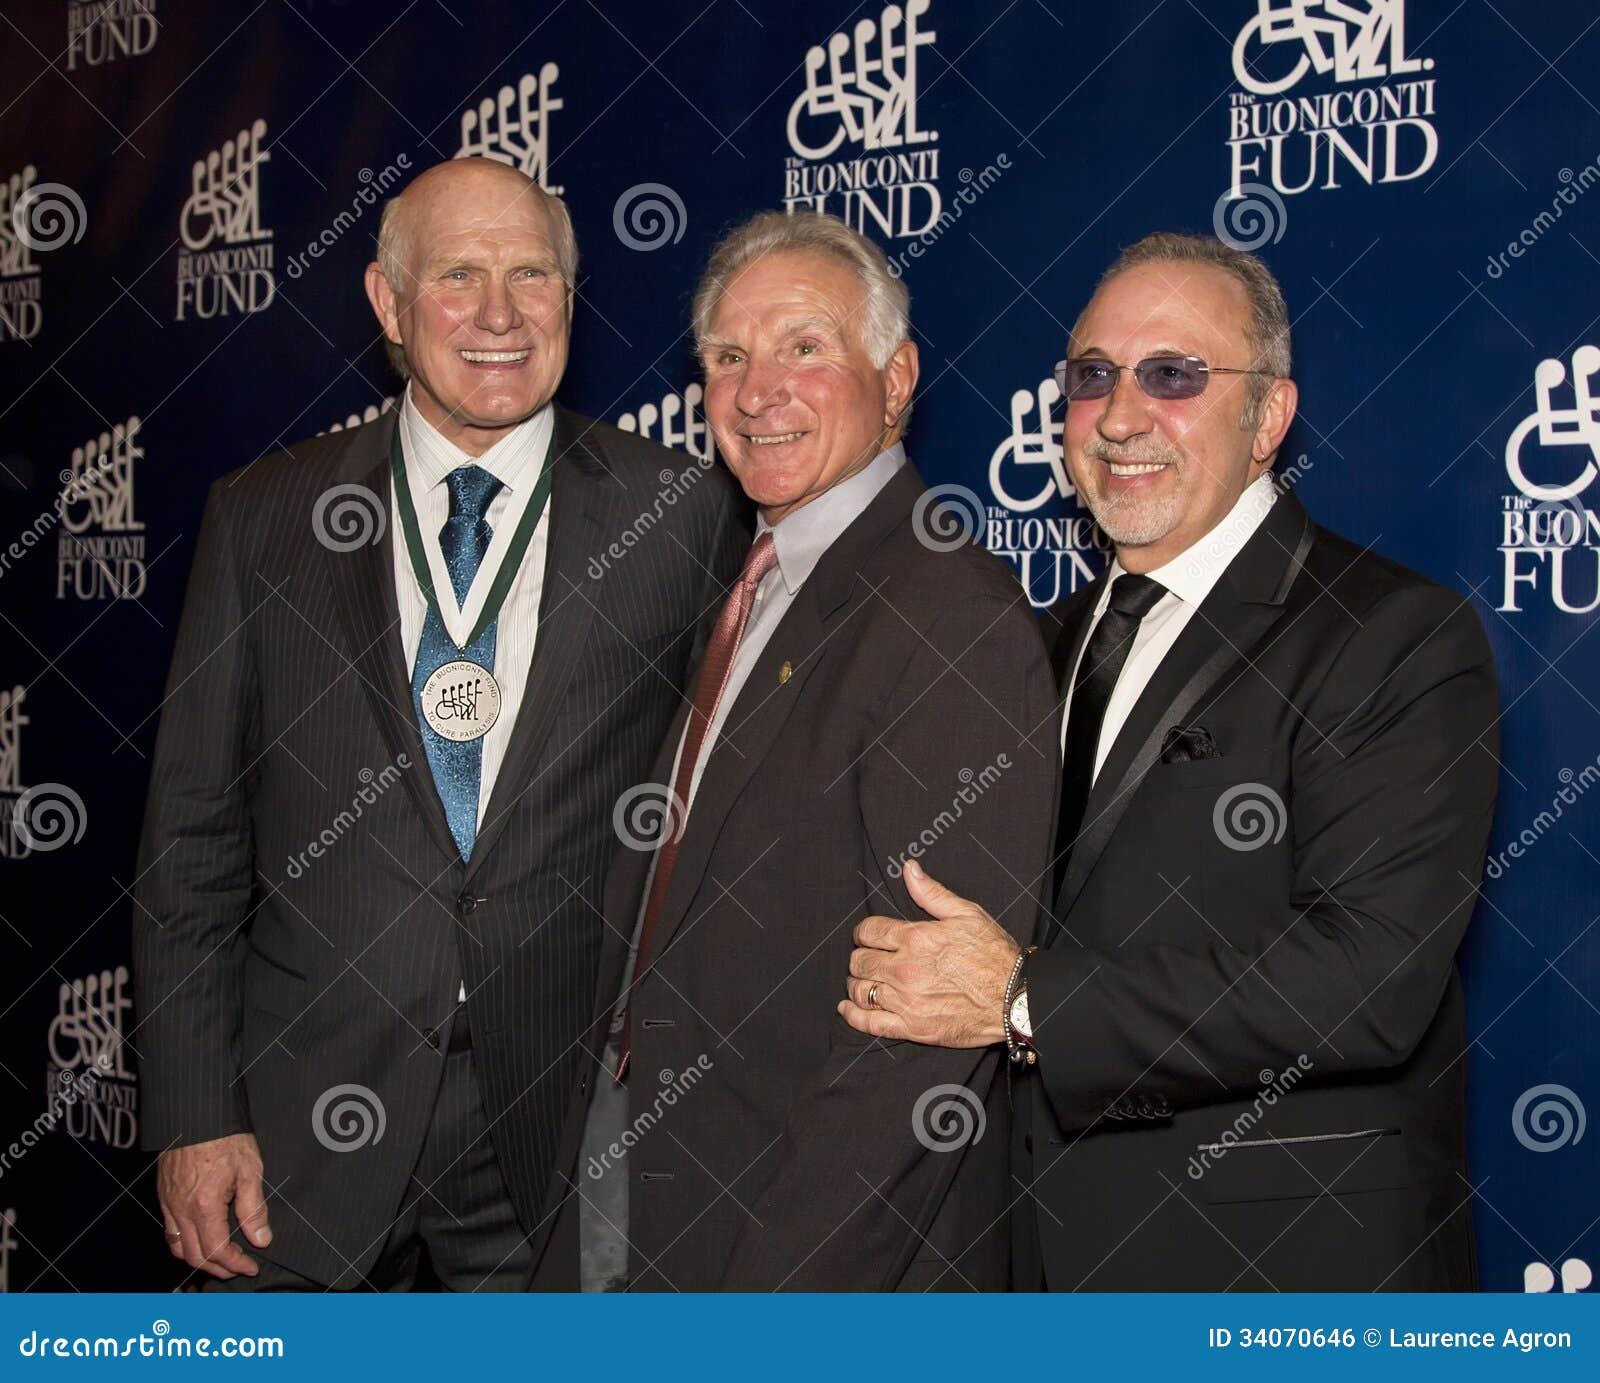 Terry Bradshaw, Nick Buoniconti, and Emilio Estefan